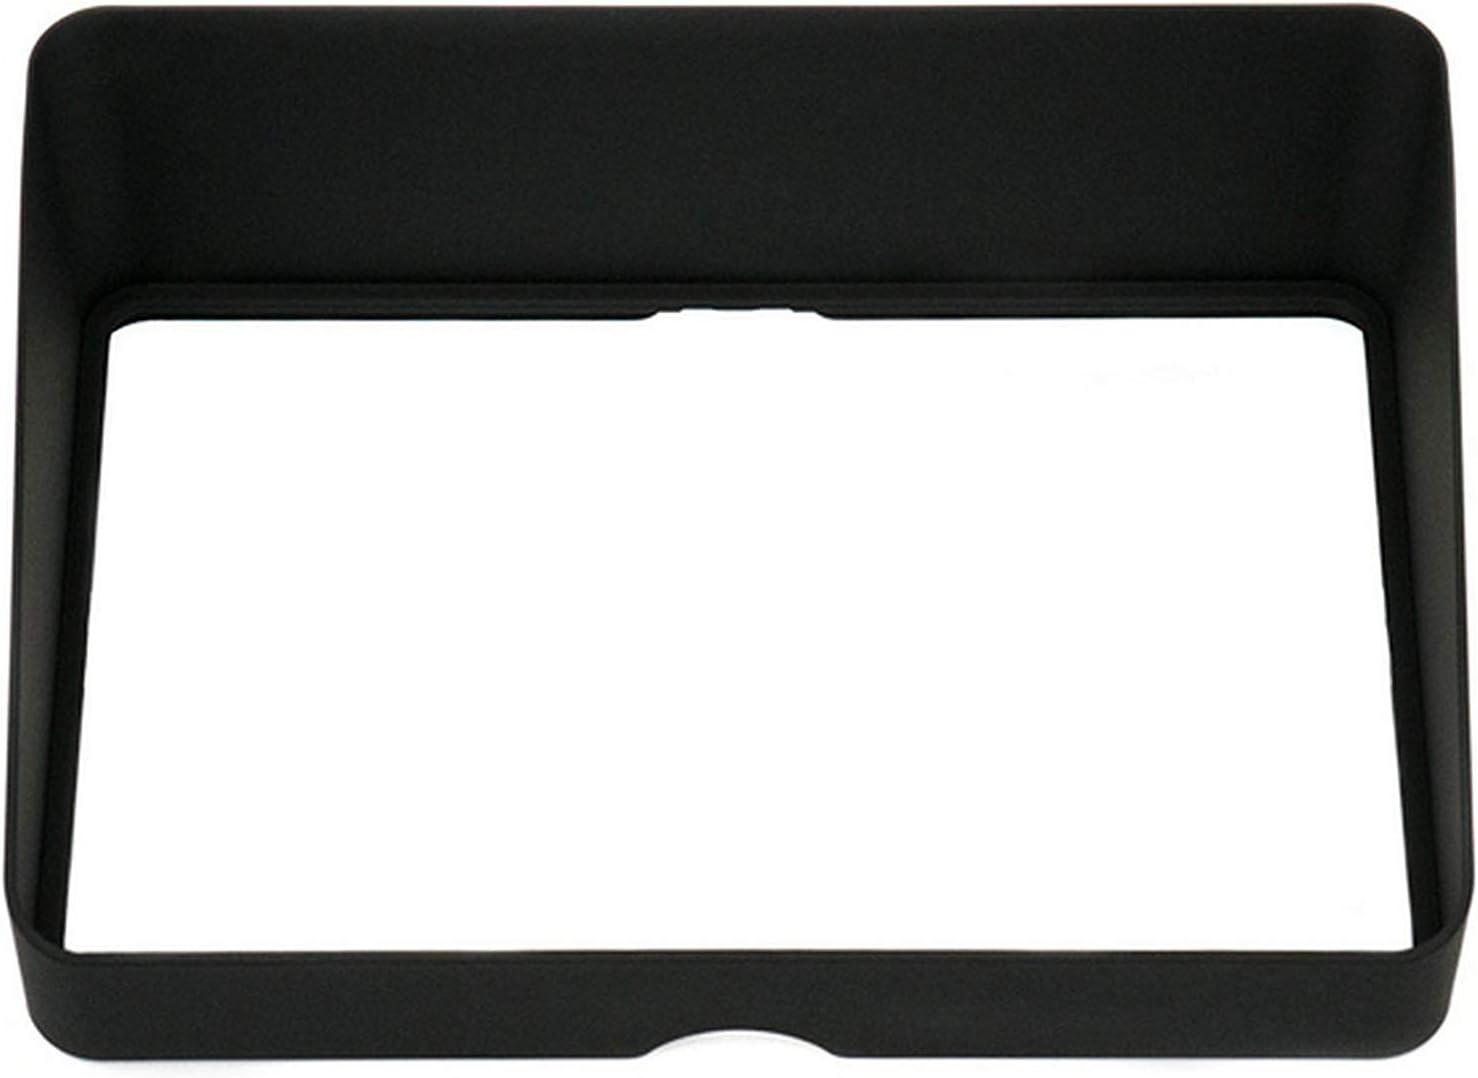 SmallHD Sun Hood for FOCUS 5 On-Camera Monitor